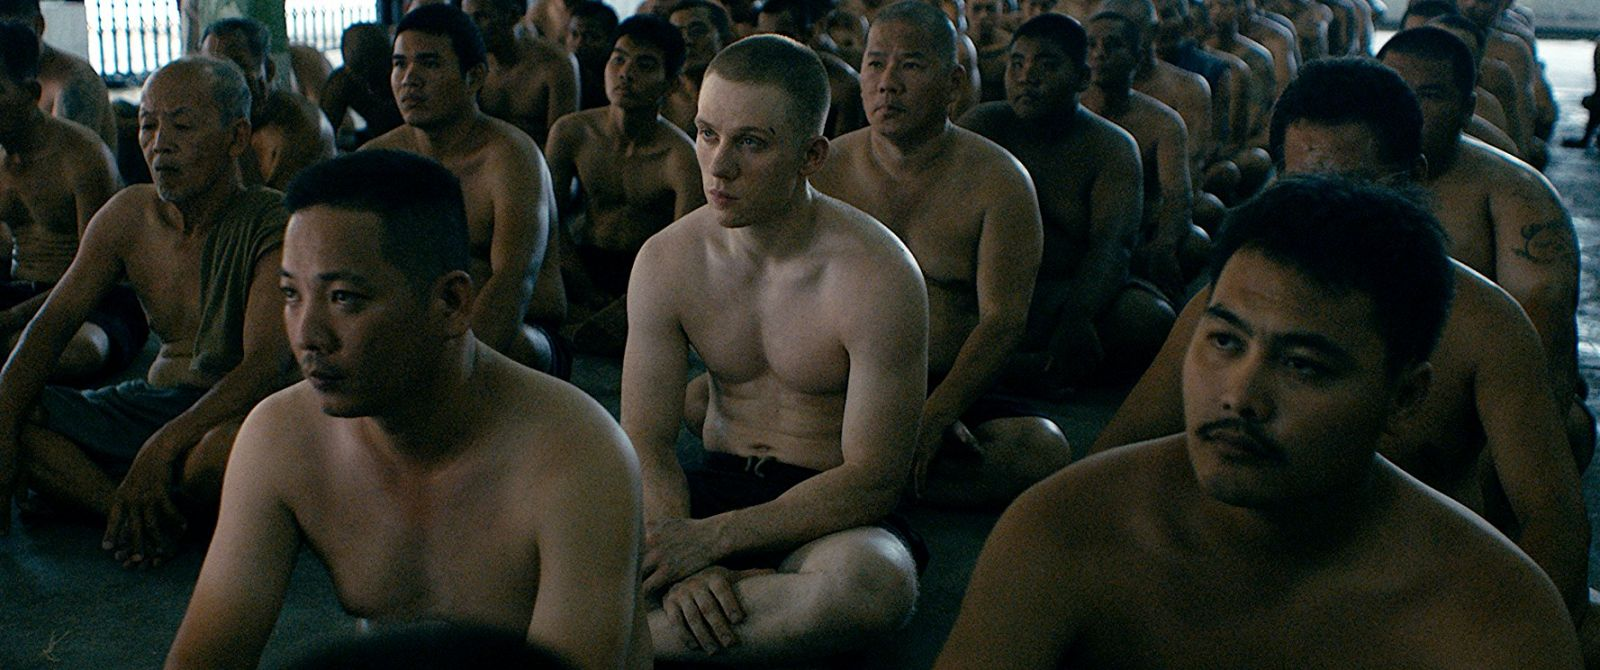 Кадр из фильма «Бои без правил»